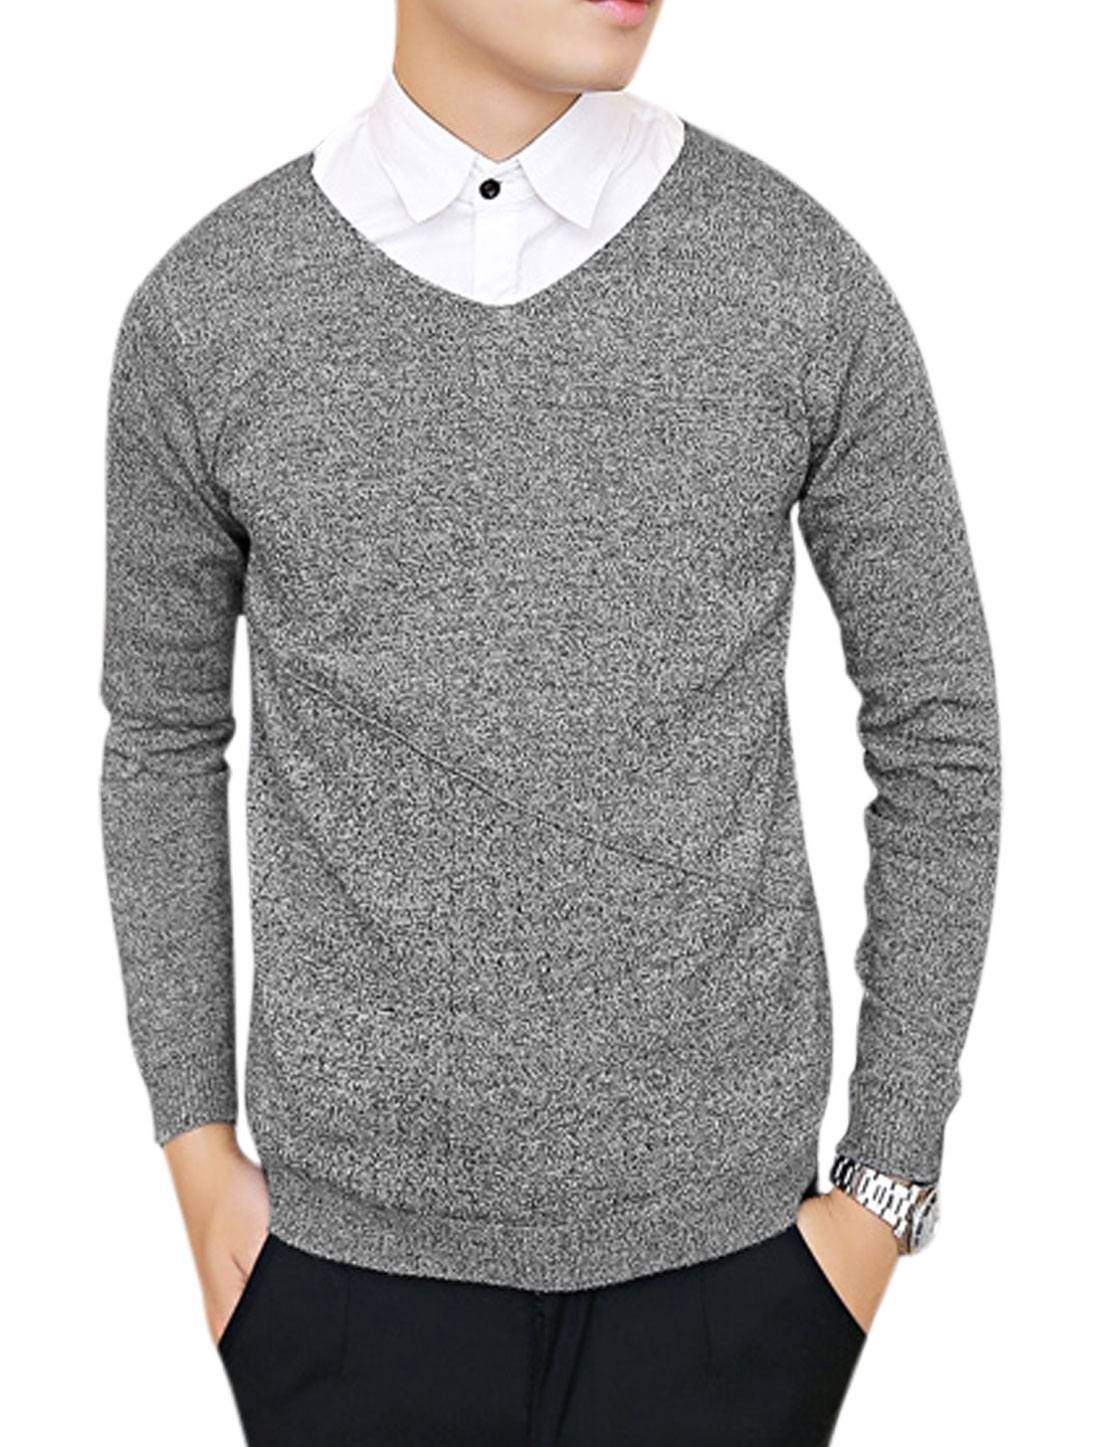 Fashion Slipover Long Sleeves Dark Gray Sweater for Man S